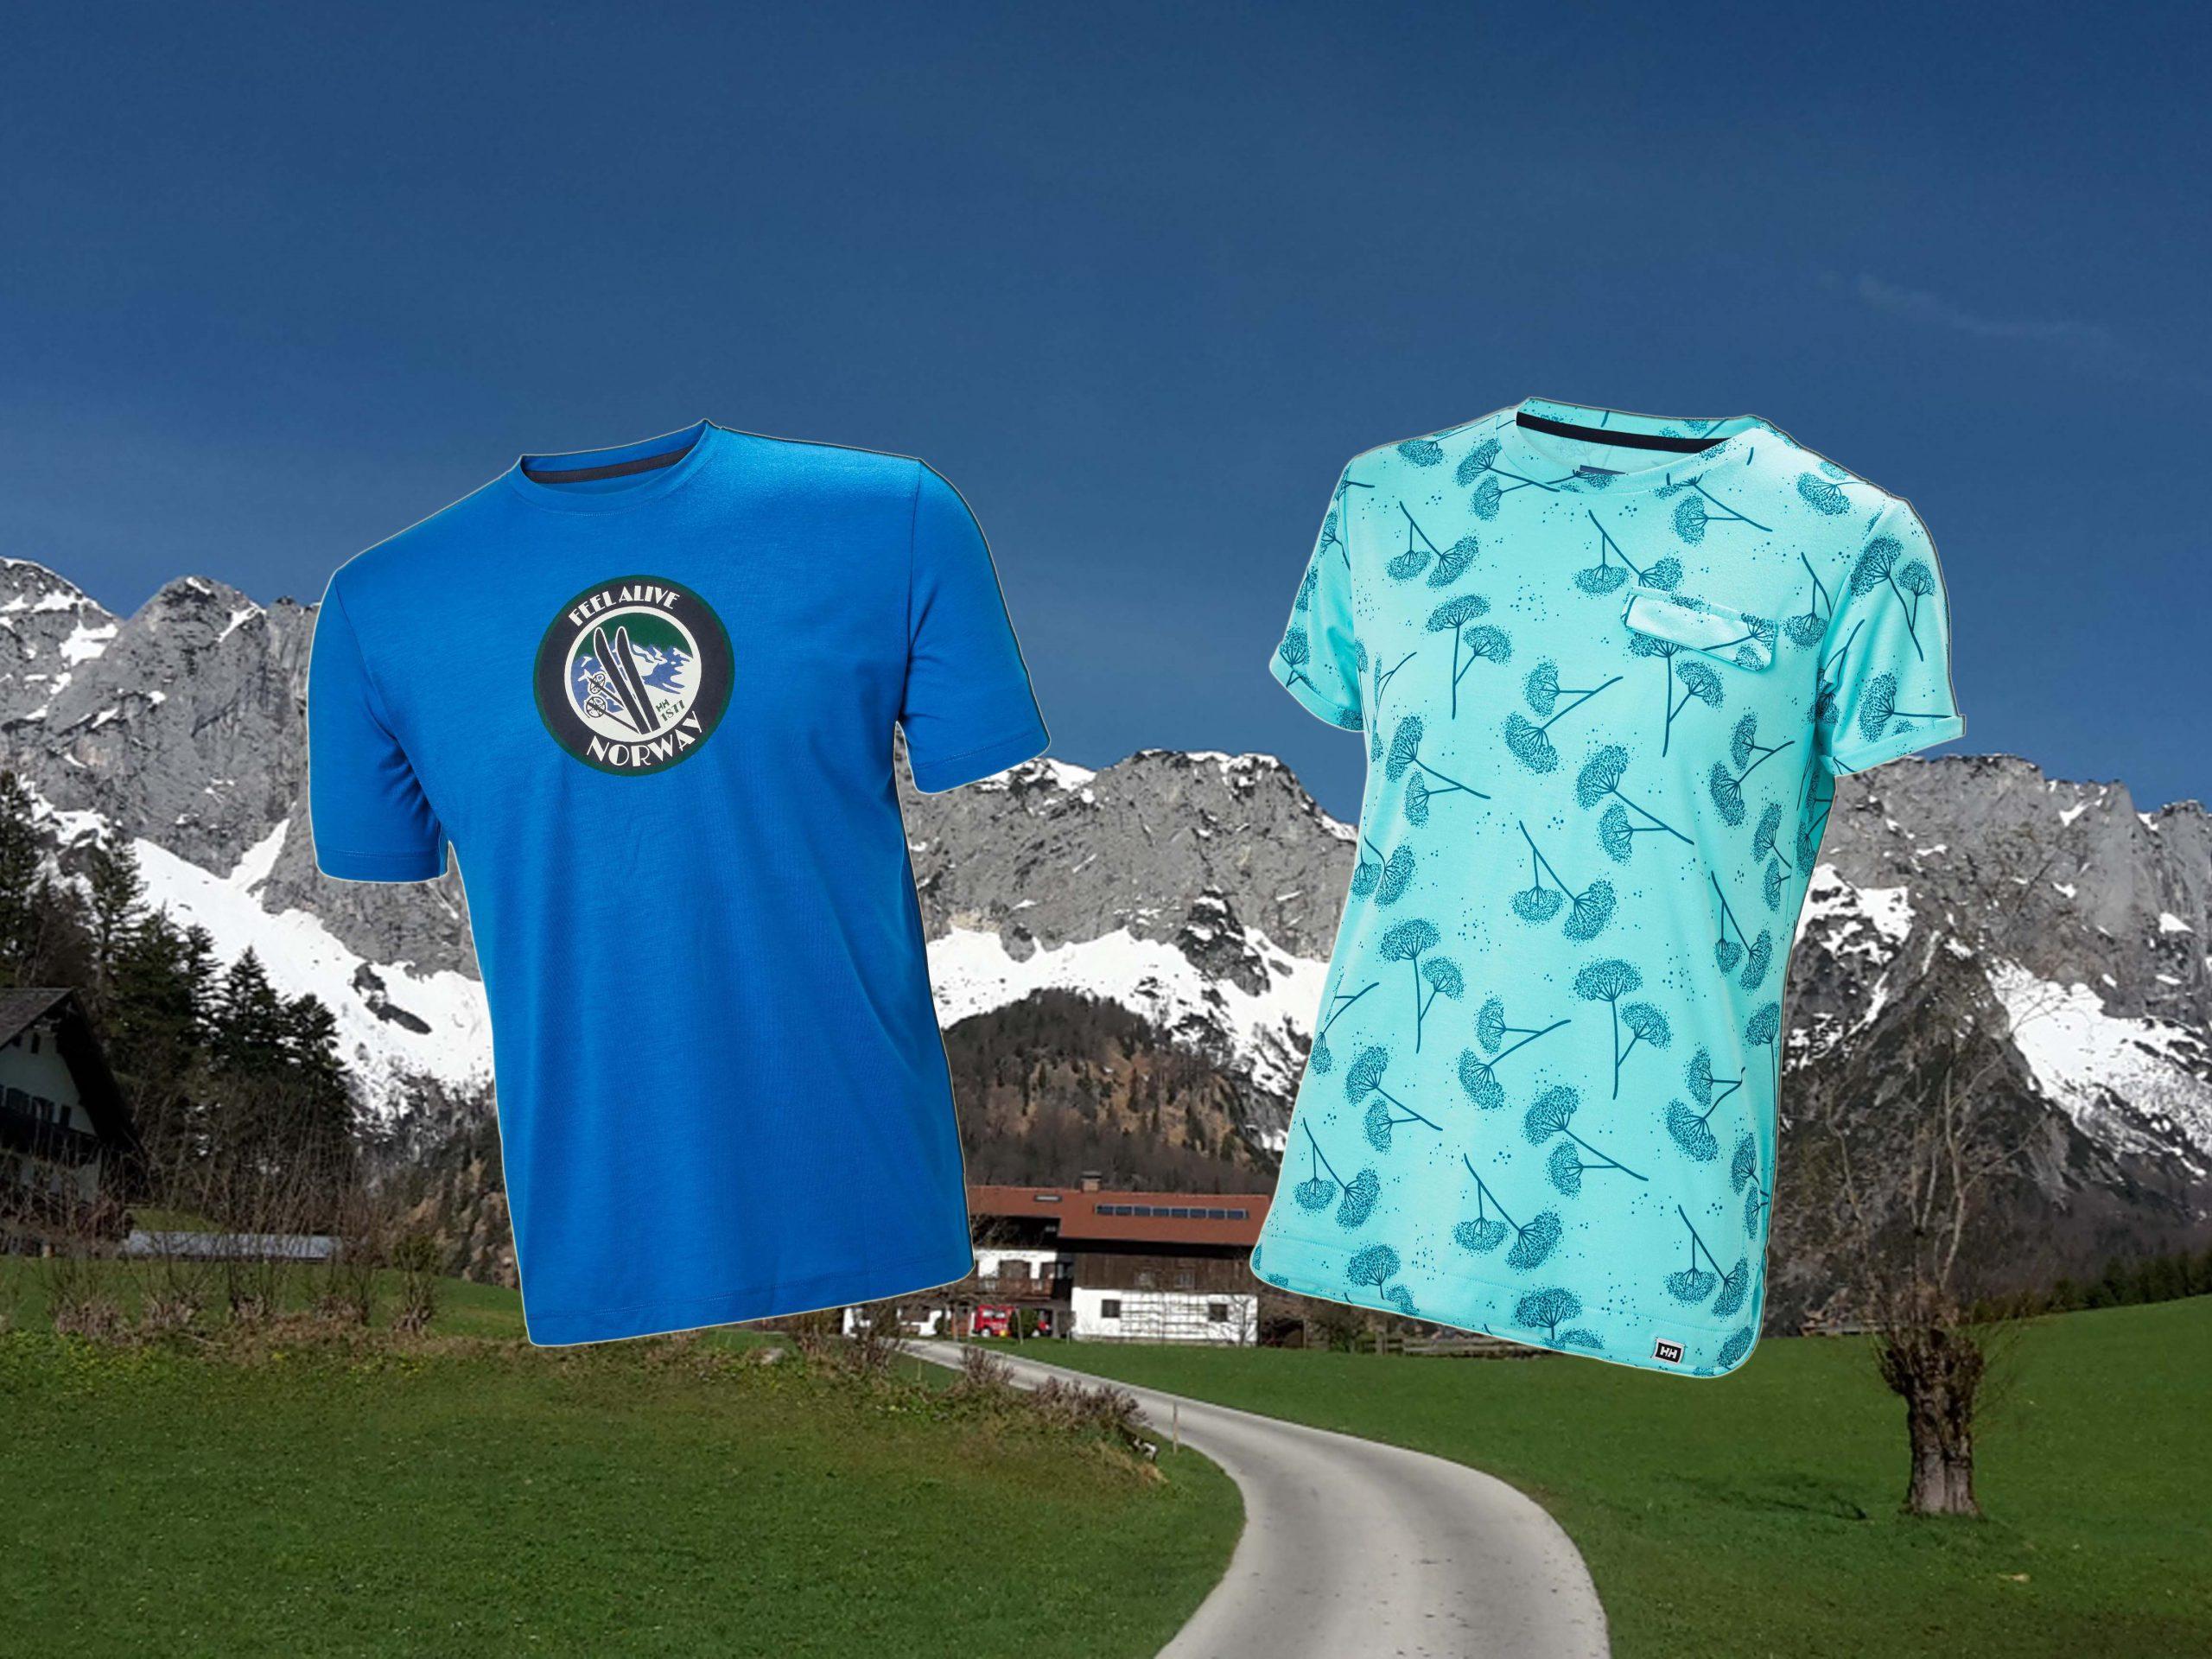 (c)be-outdoor.de - Helly Hansen Lomma T-Shirt Muttertag 2021